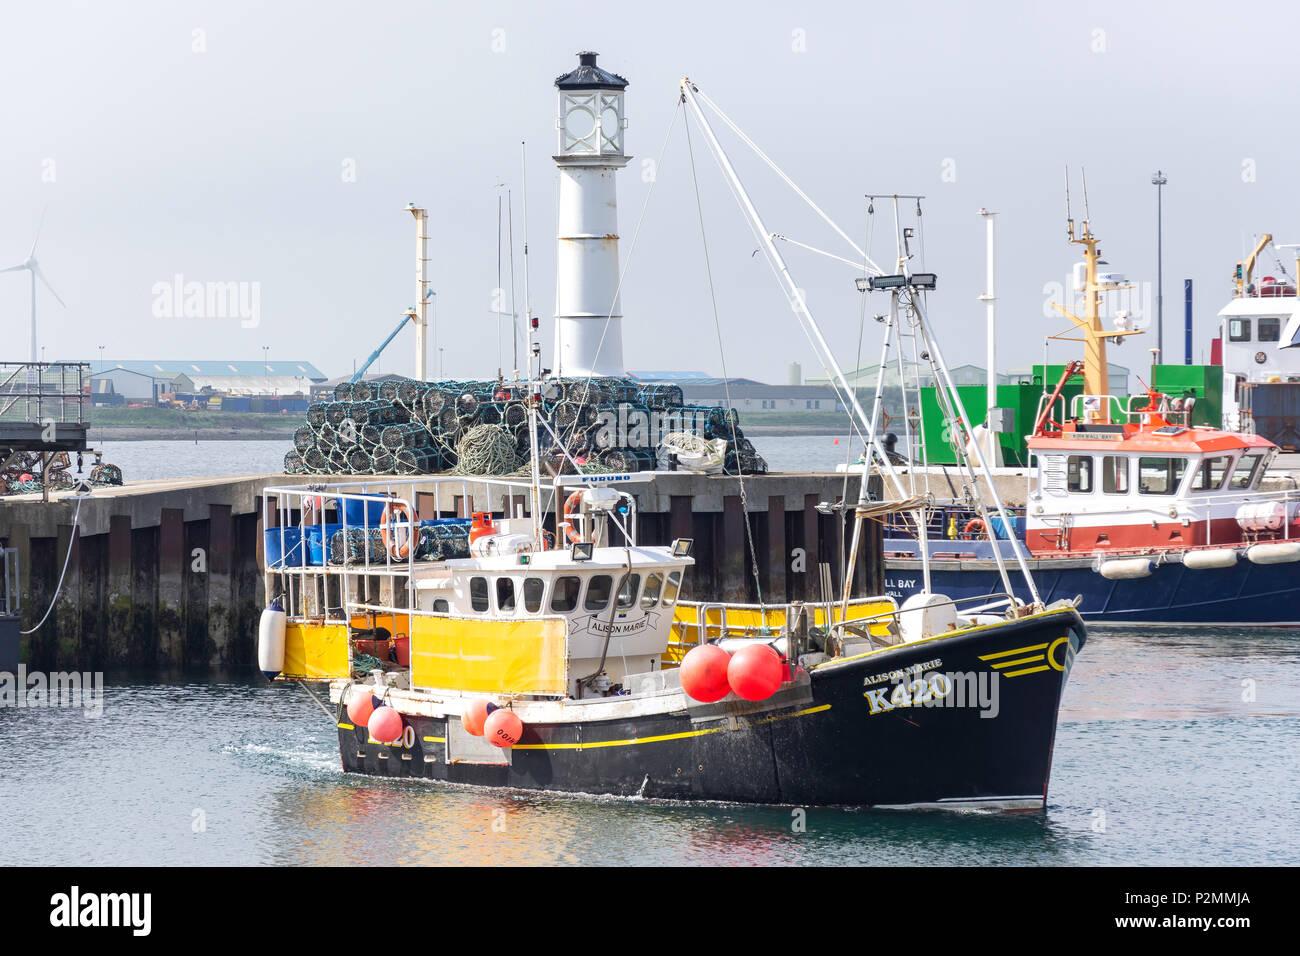 Fishing boat entering harbour, Kirkwall, Mainland, Orkney Islands, Northern Isles, Scotland, United Kingdom - Stock Image